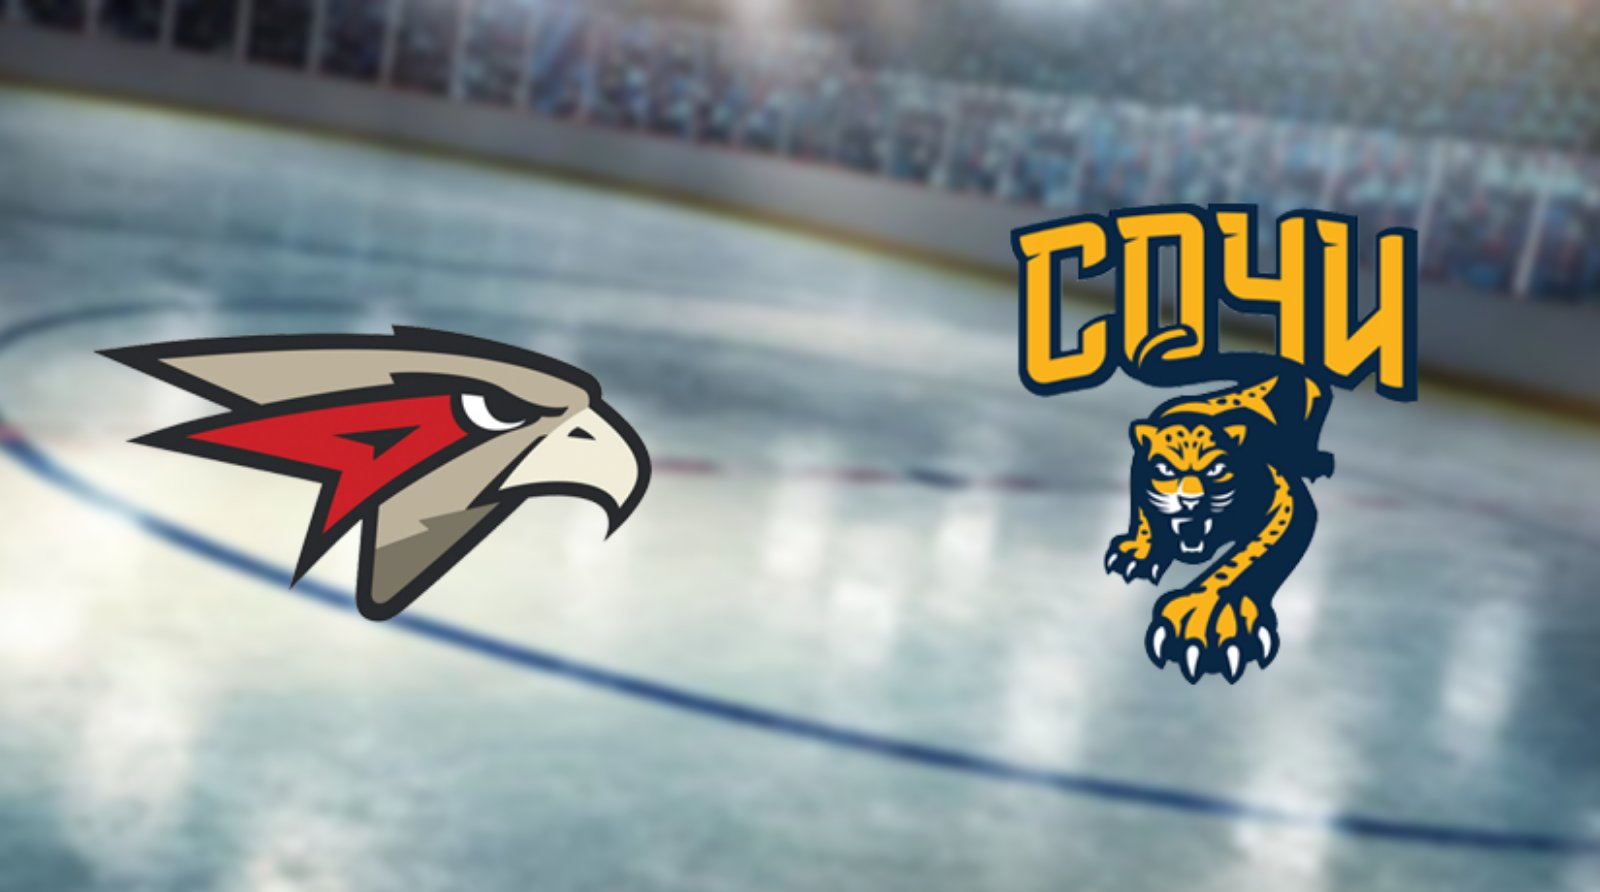 Avangard vs Sochi Prediction KHL: 23.01